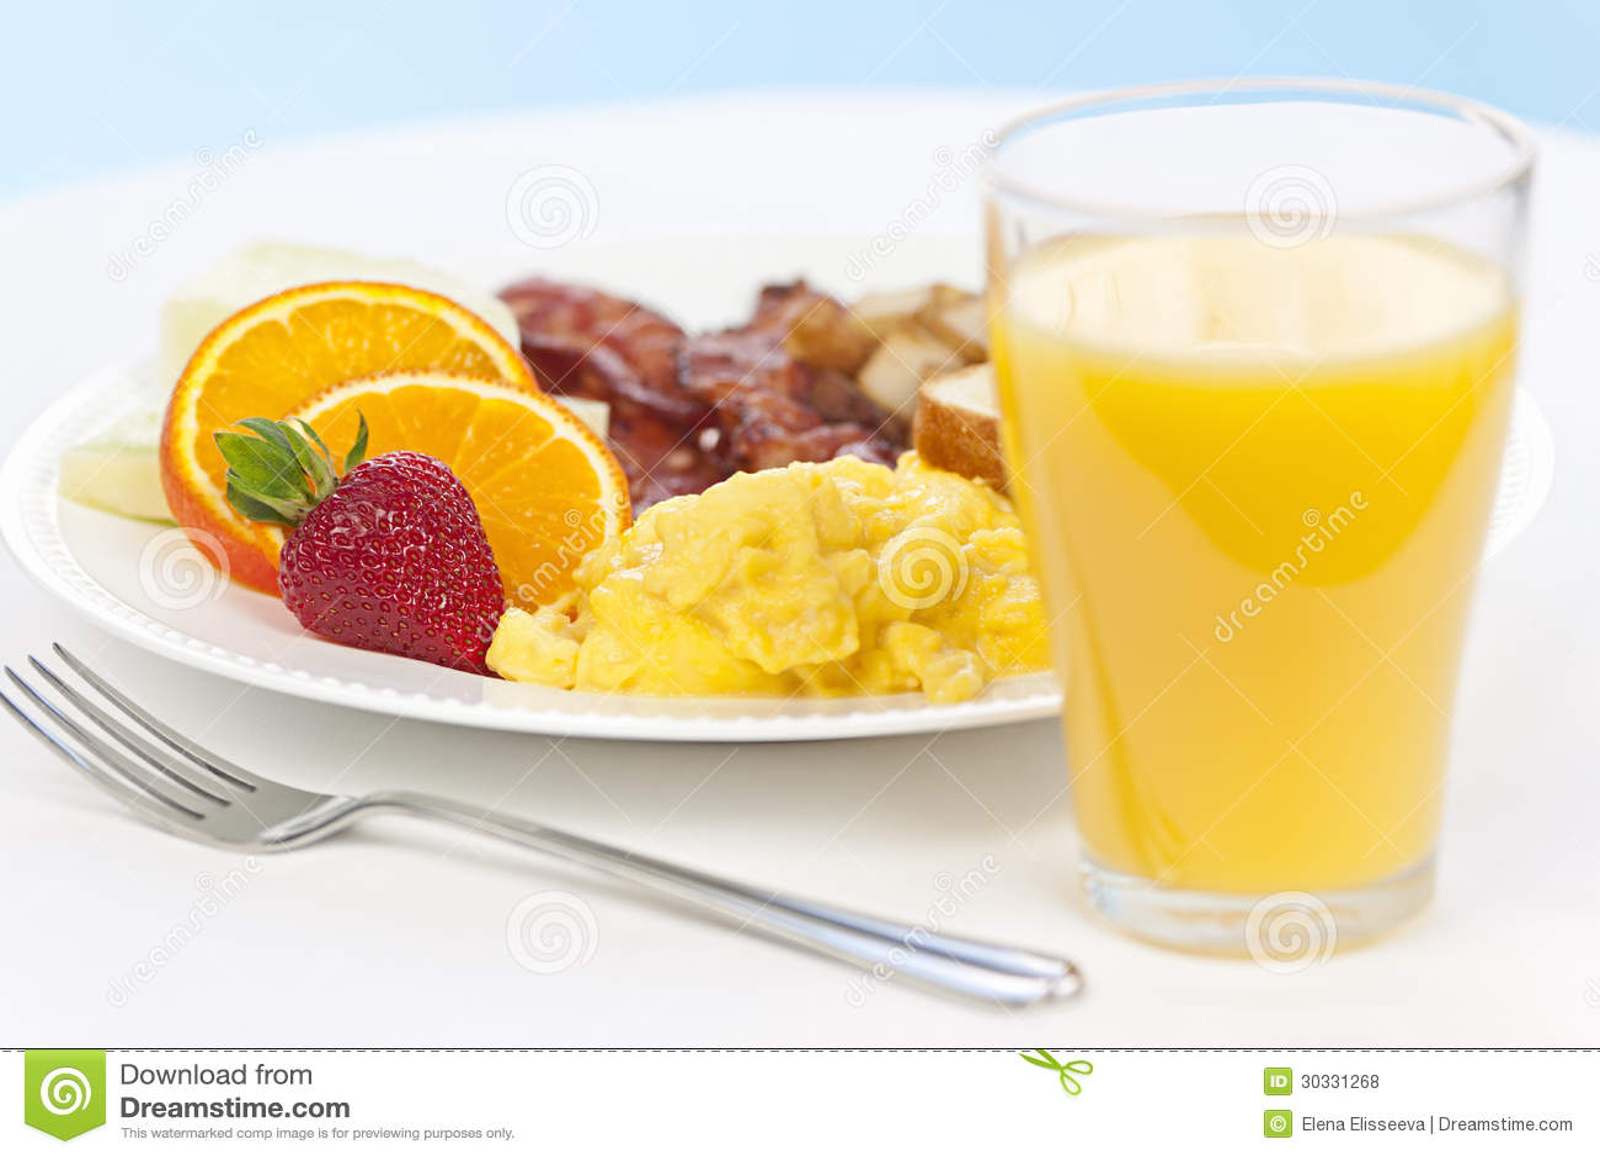 cereal fruit and orange juice orange sorbet carrot and orange